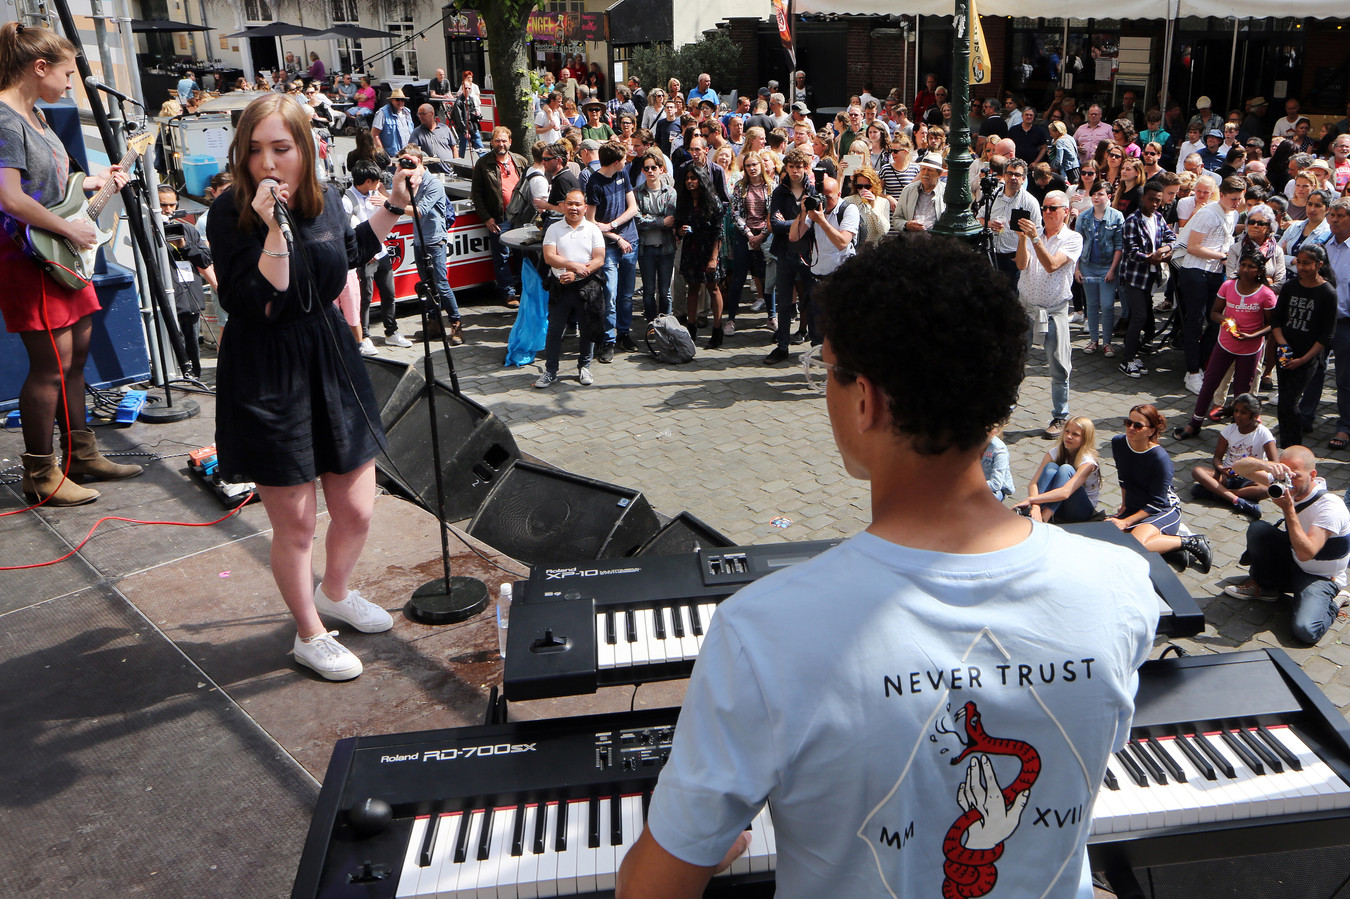 20180511 - Breda - Jazzfestival 2018 - Kerkplein - Jazz at the Castle Talent Award: optreden van 'Bumping Beans' FOTO: RAMON MANGOLD/ PIX4PROFS